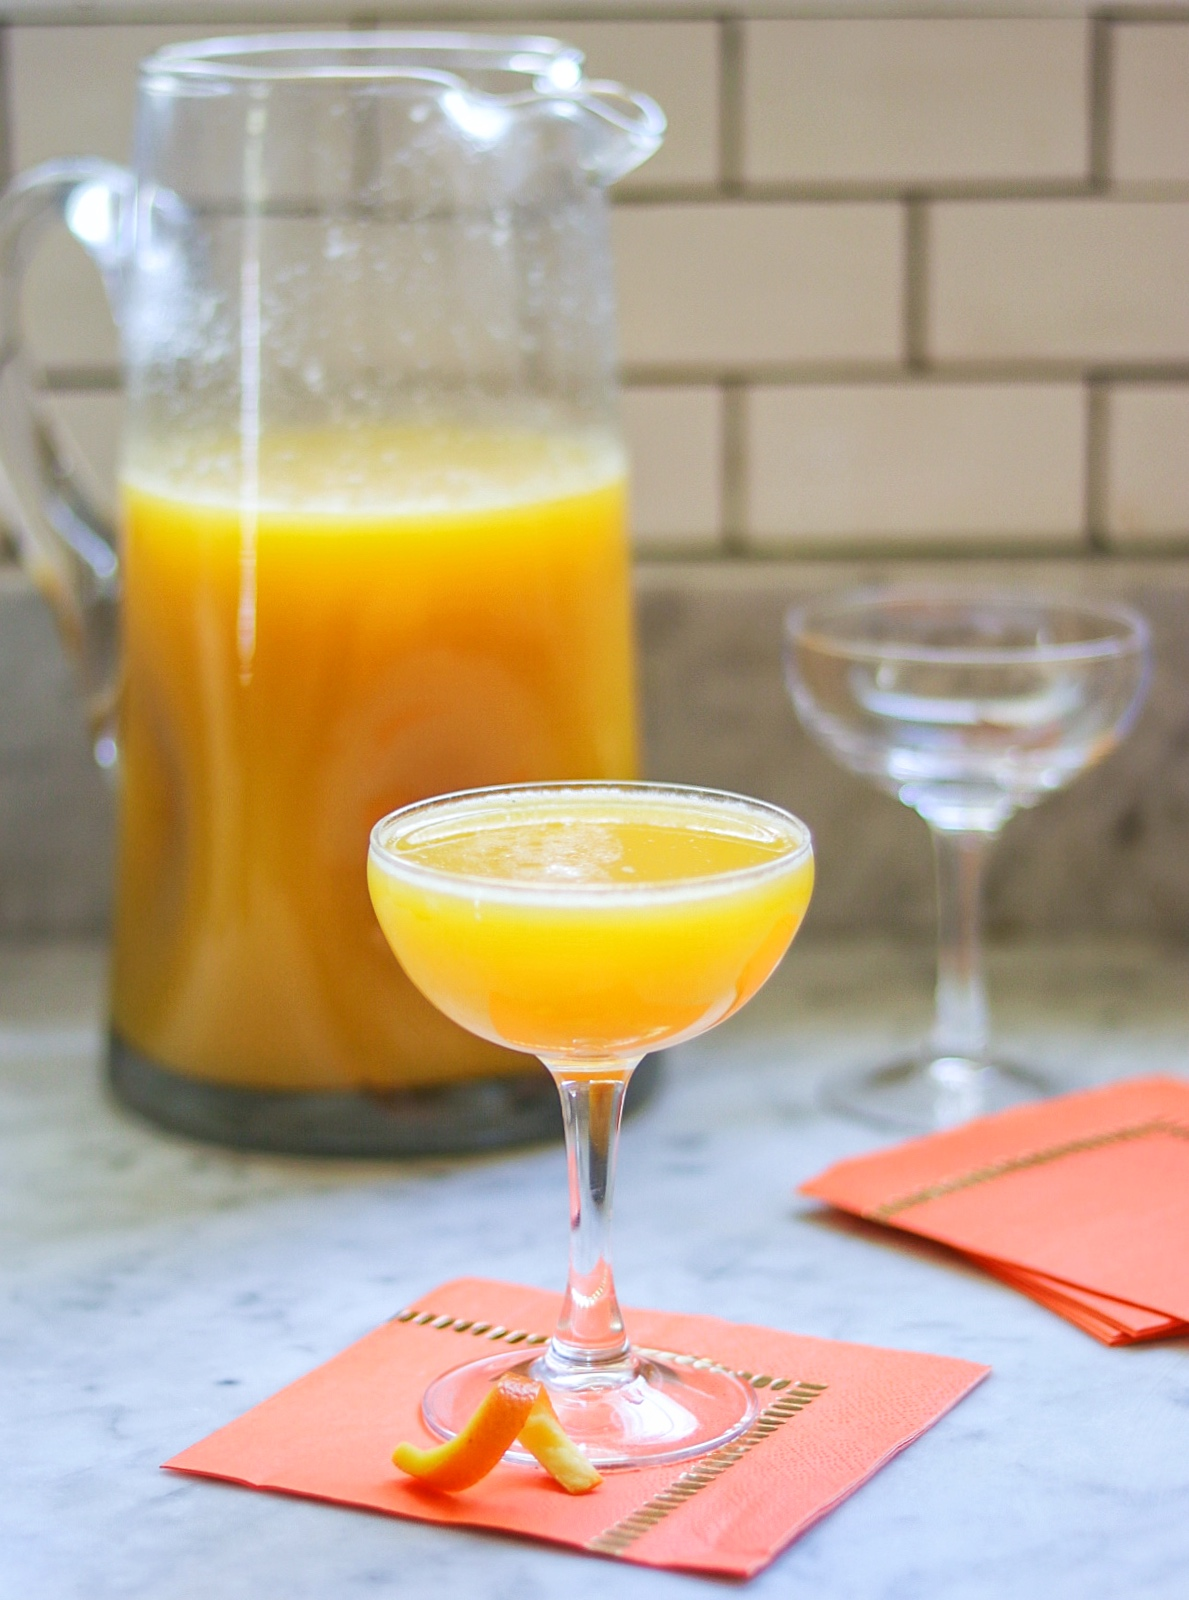 Pineapple-Apricot Mimosas